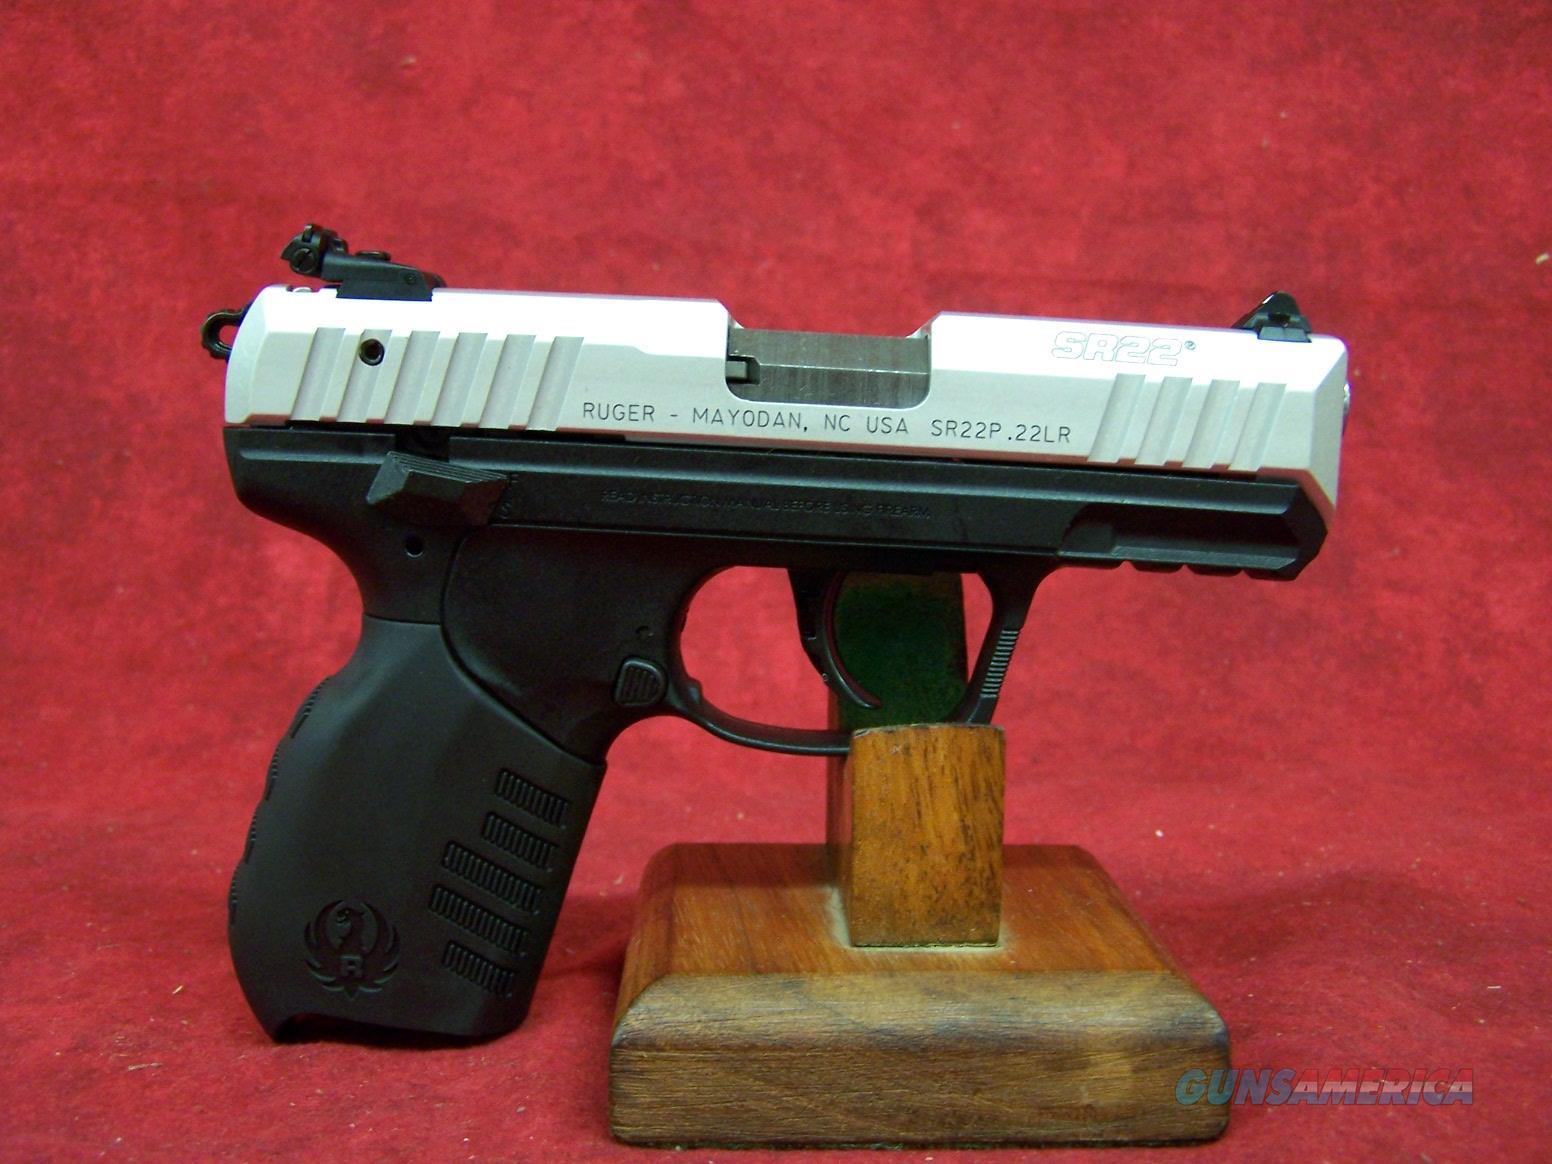 "Ruger SR22PS 22lr 3.5"" Barrel Silver Anodize Slide Finish (03607)  Guns > Pistols > Ruger Semi-Auto Pistols > SR Family > SR22"